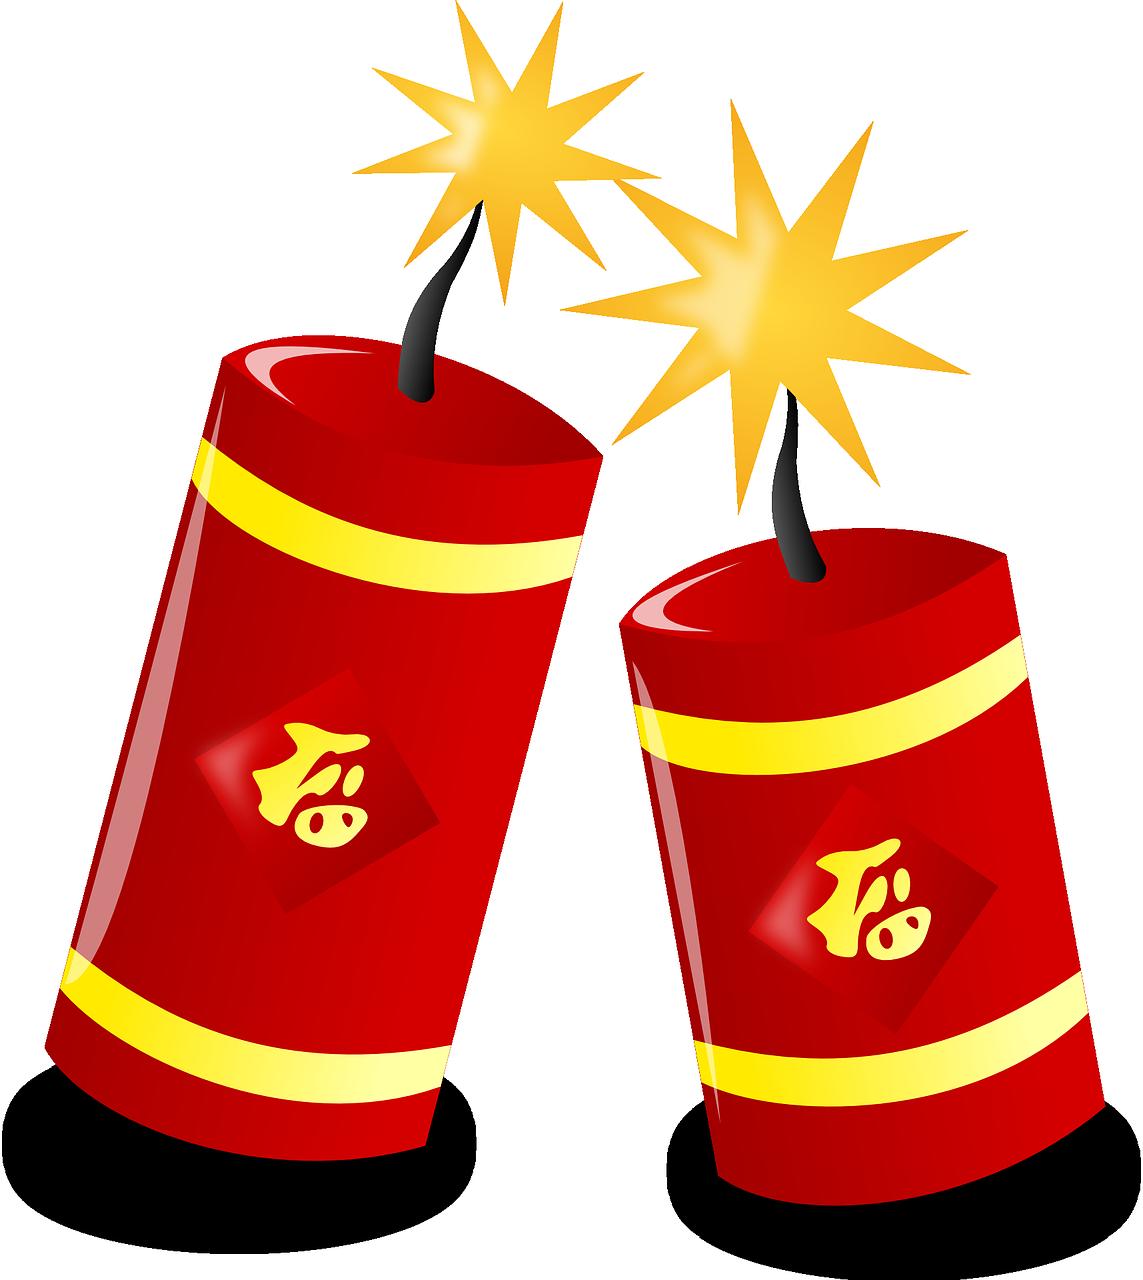 fireworks-152012_1280-線上英文, 生活英文, 商業英文, 英文家教, 線上英文教學, 線上英文學習,  線上英文課程, 英文線上教學, 一對一線上英文教學, 一對一線上英語教學, 商業英文, 商用英文,  生活英文, 青少年英文, 兒童英文, 旅遊英文, 英文會話, 多益 Toeic, 雅思, 全民英檢, ESL